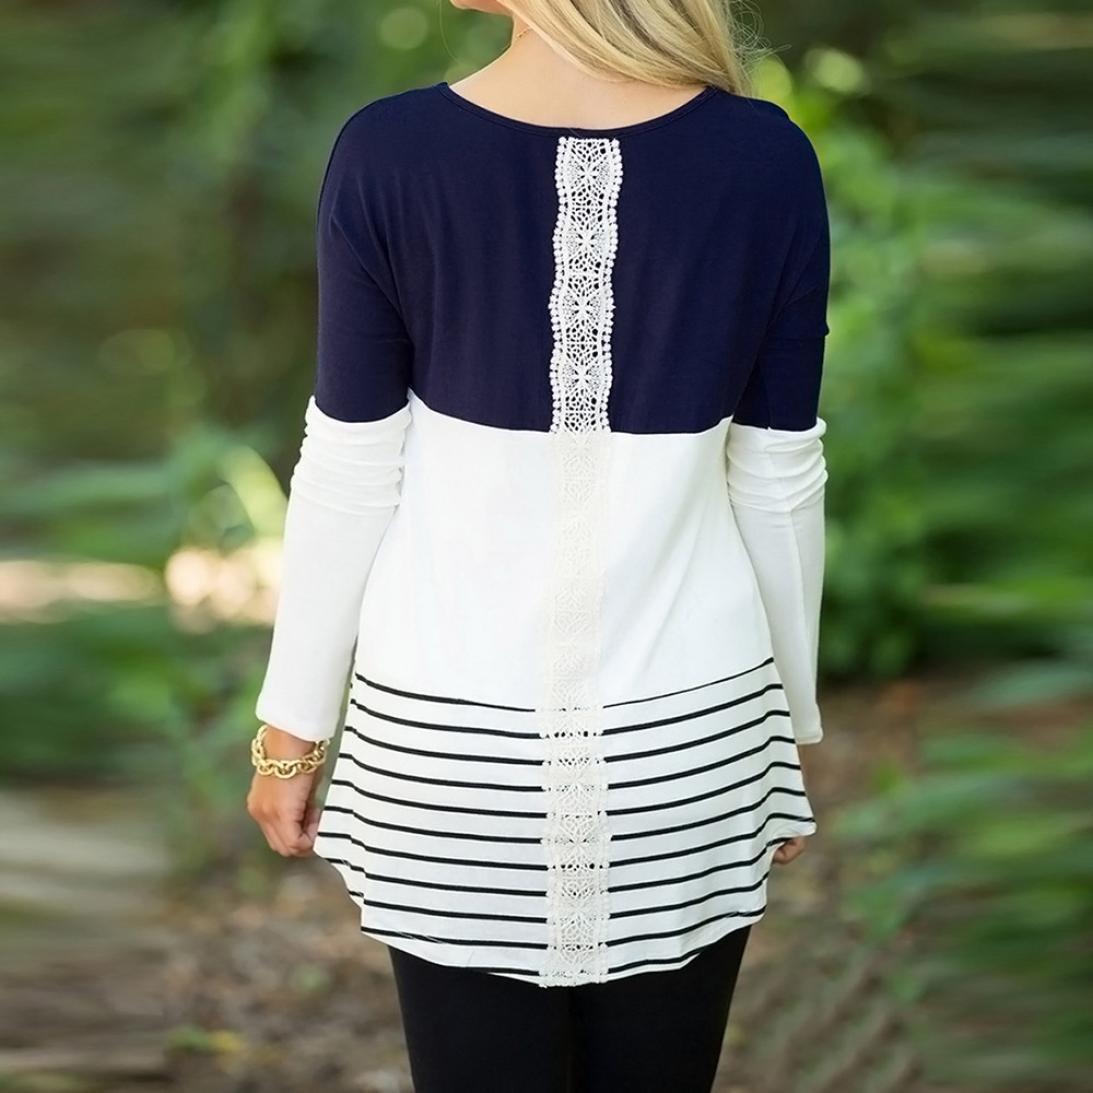 159e520082c Amazon.com  HANYI Women Plus Size Comfy Swing Long Sleeve Back Lace Floral  Tunics Tops Christmas Shirt Blouse (Navy